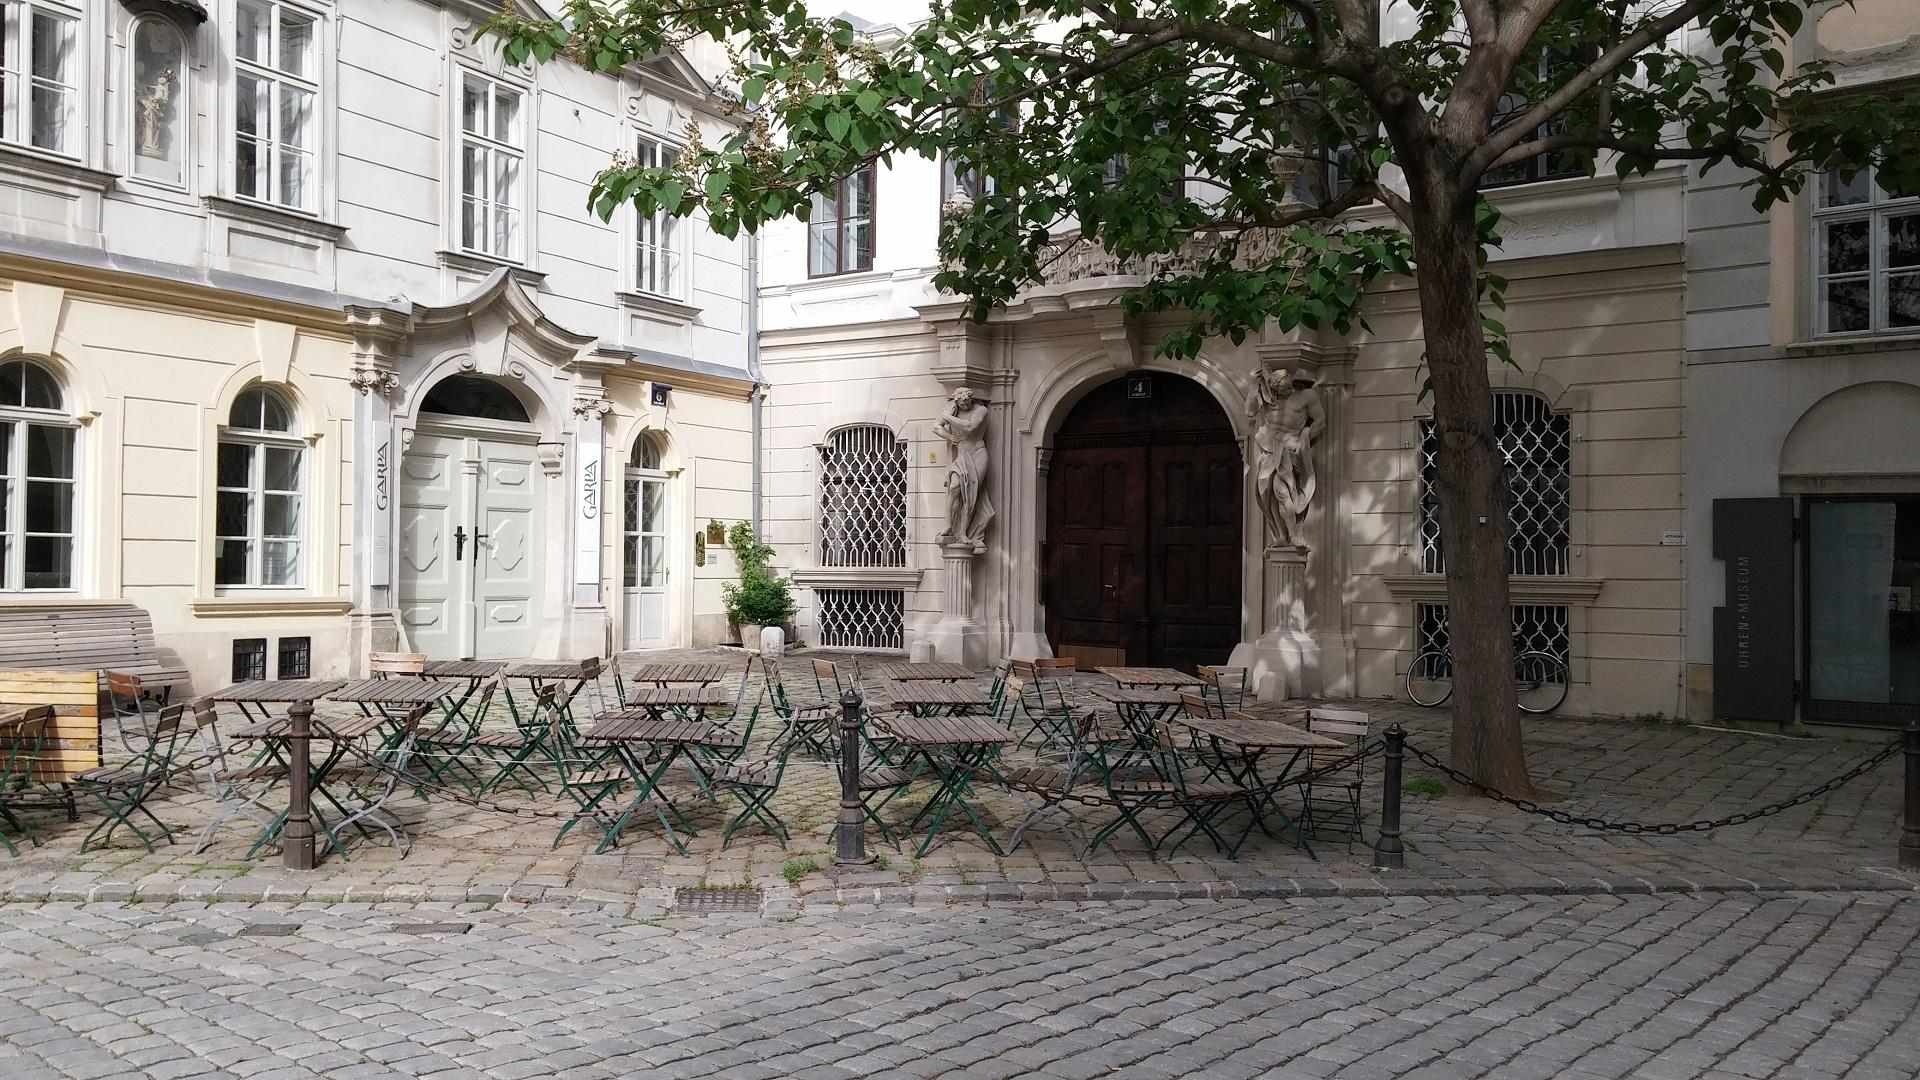 Narrow street in Vienna